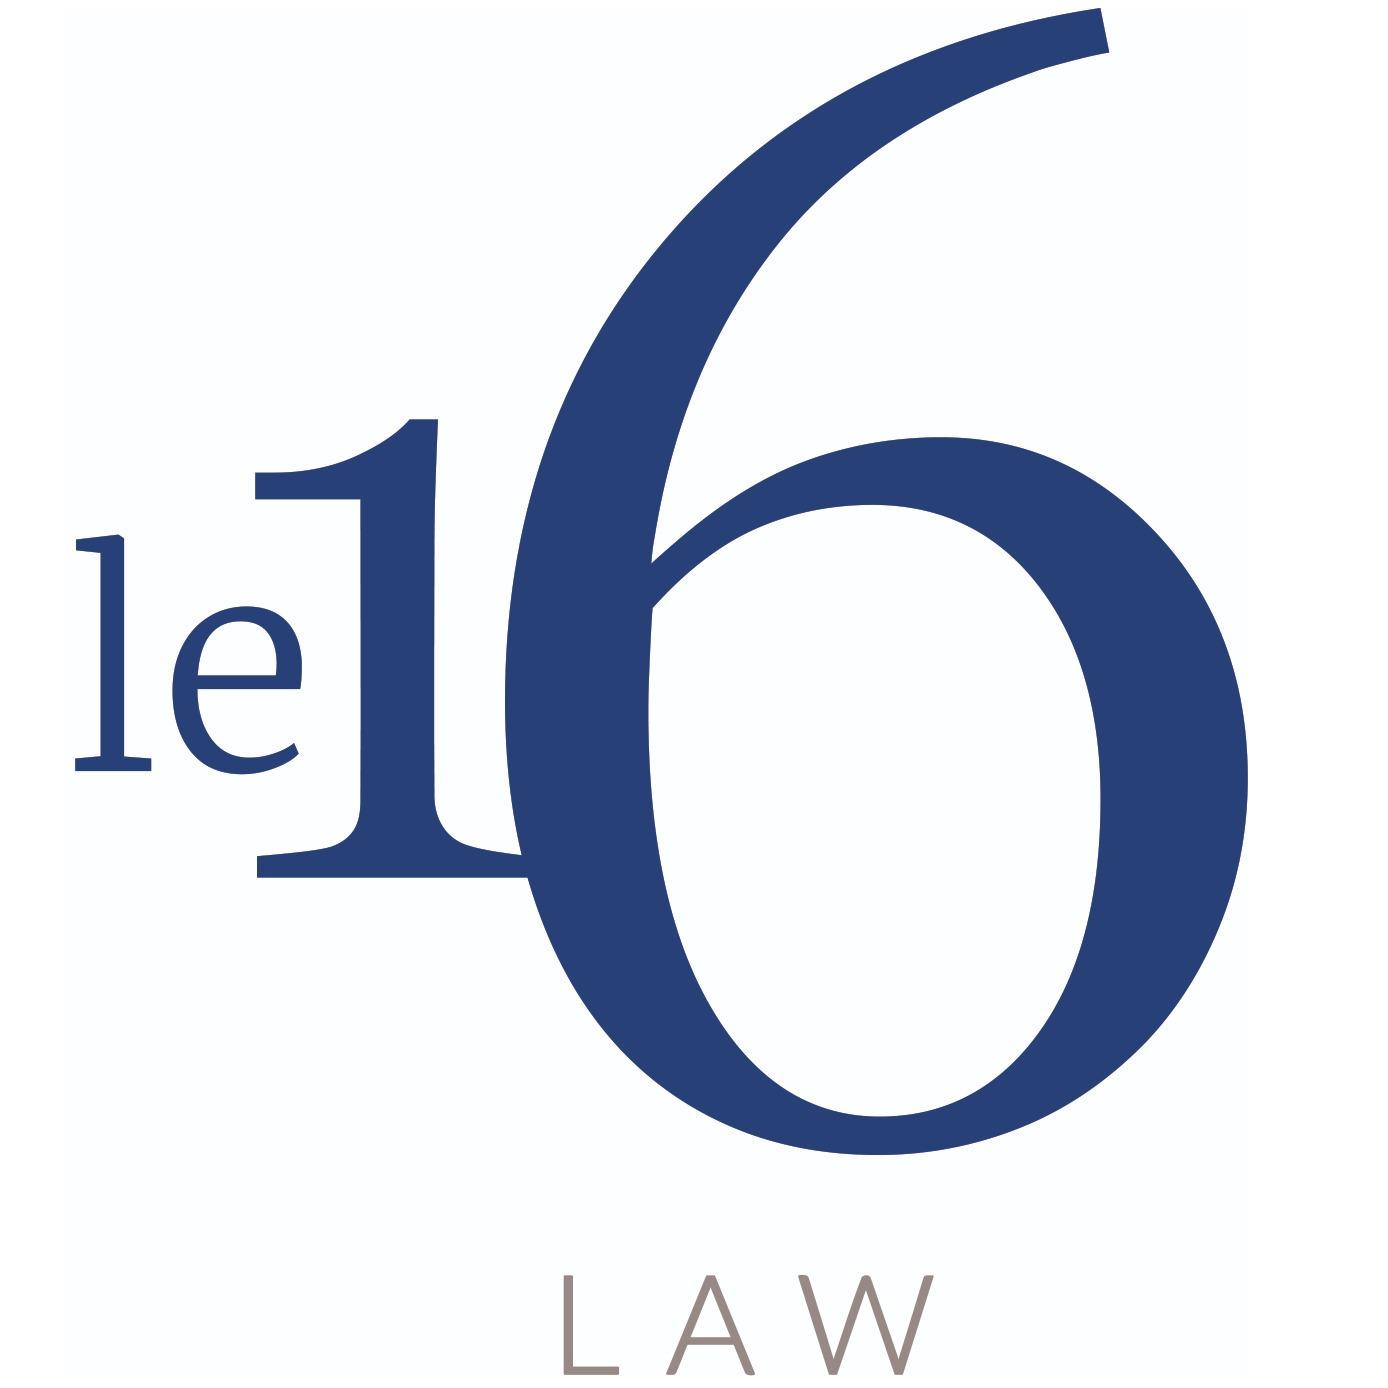 the Le 16 Law logo.